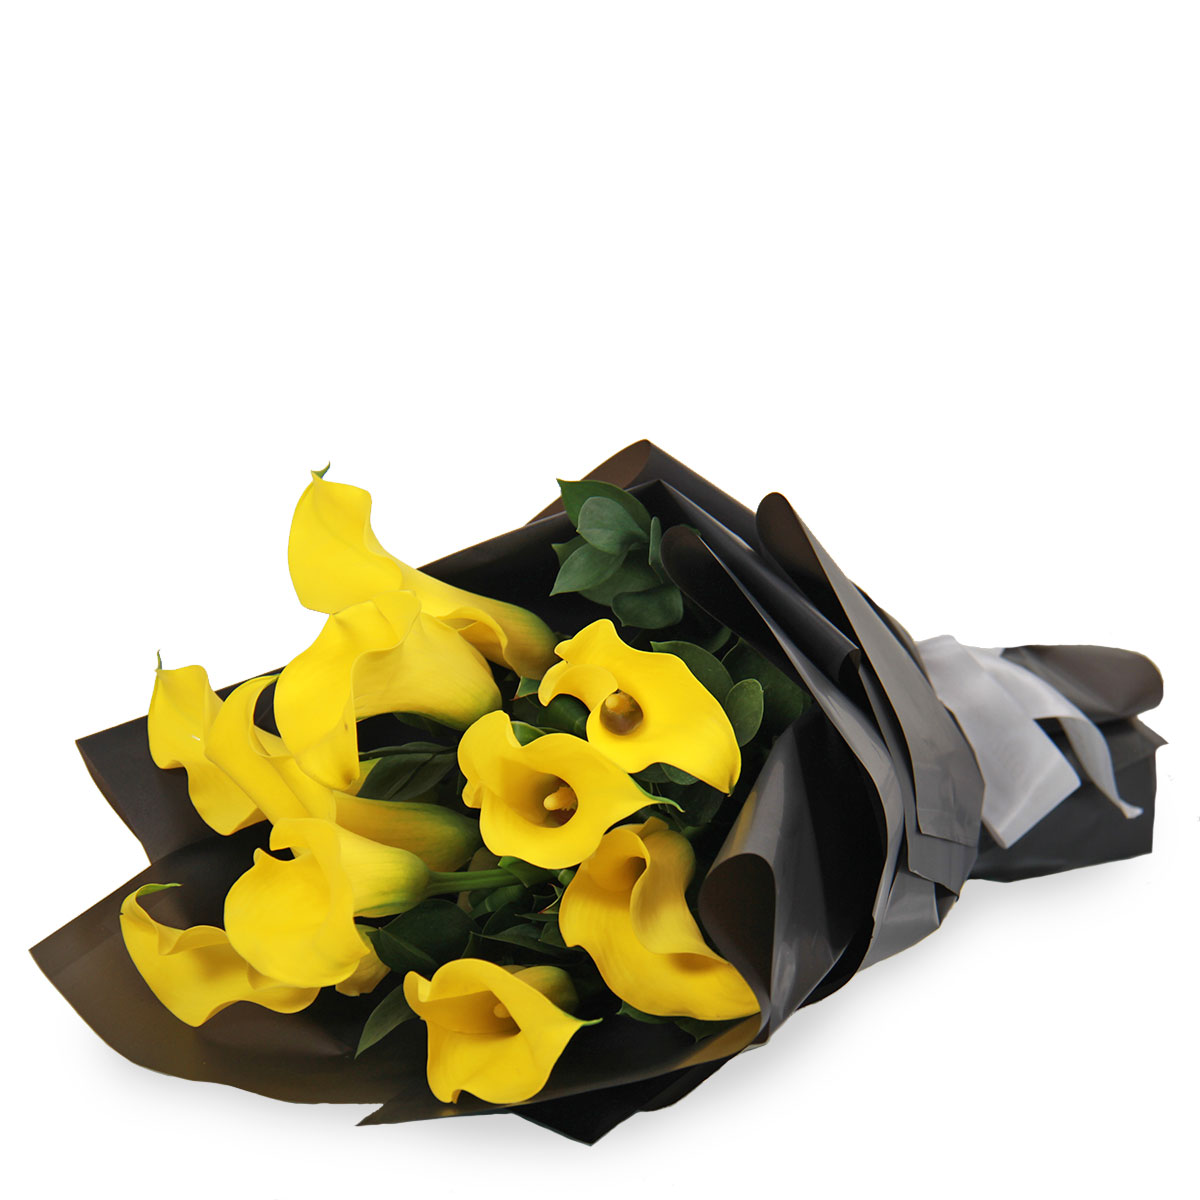 BQ1738 bright burst yellow calla lilies